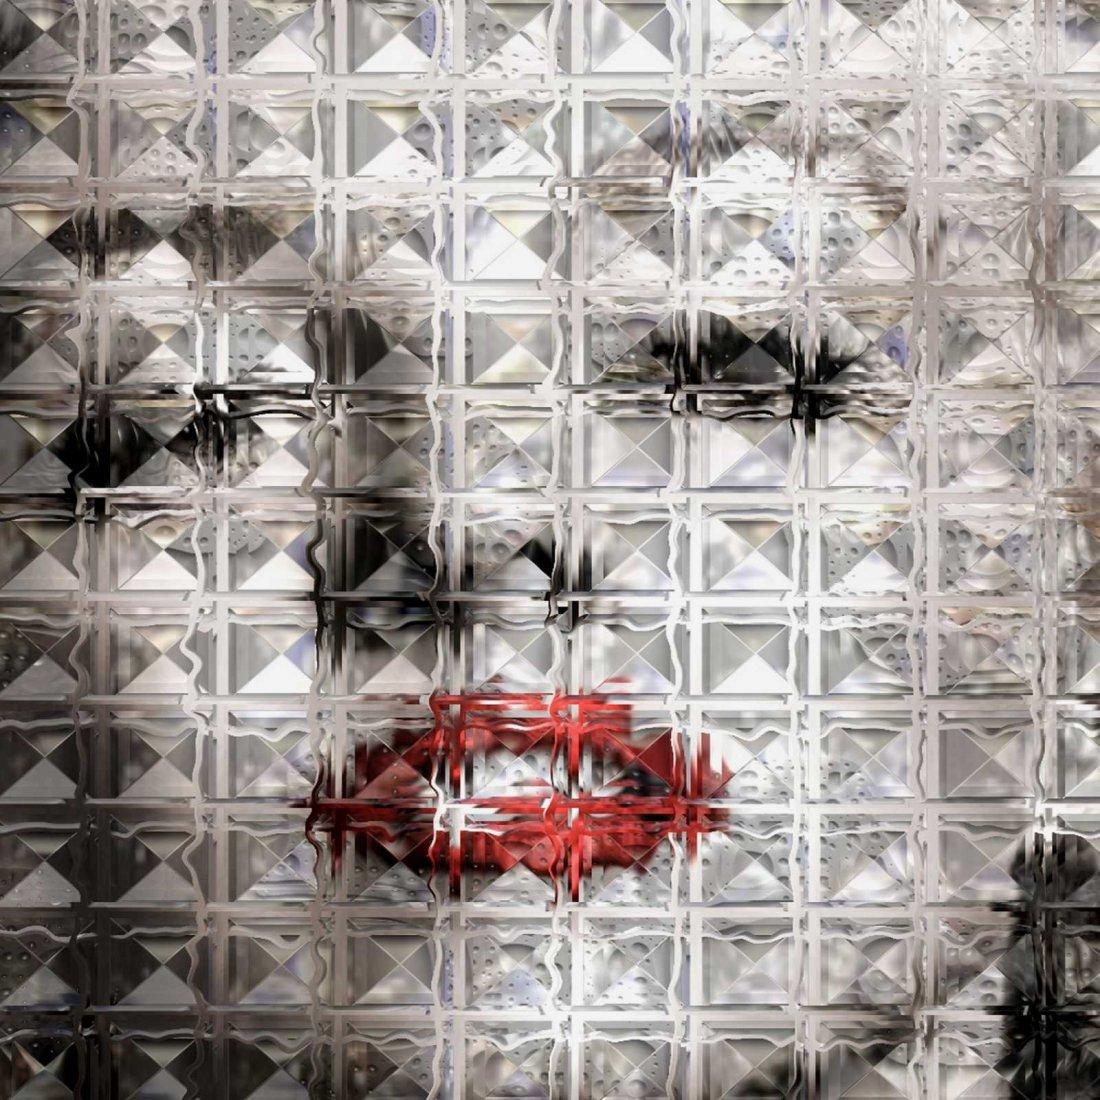 ART GRAFTS Print Marilyn, Refraction #1 - 4